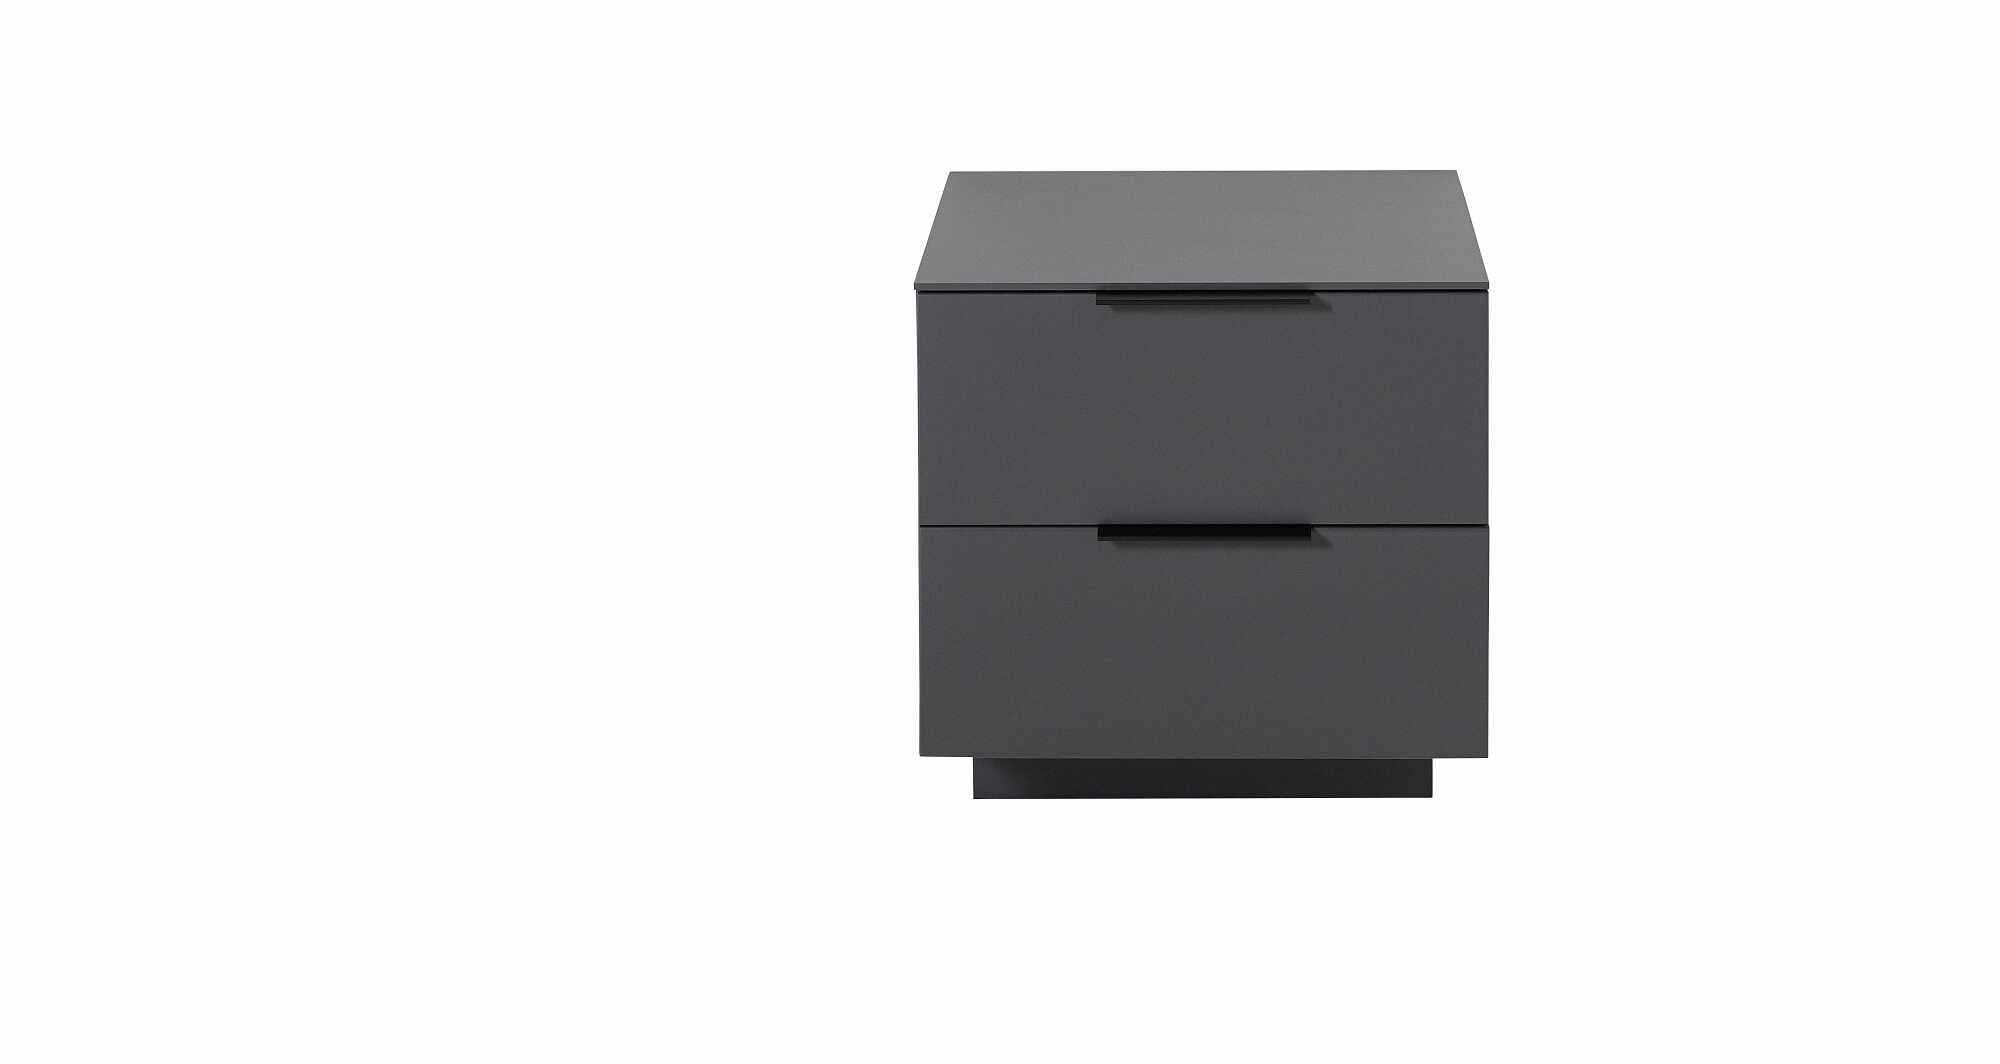 Cabinet din pal si MDF cu 2 sertare, Madeline Grafit, l60xA44xH61 cm la pret 677 lei